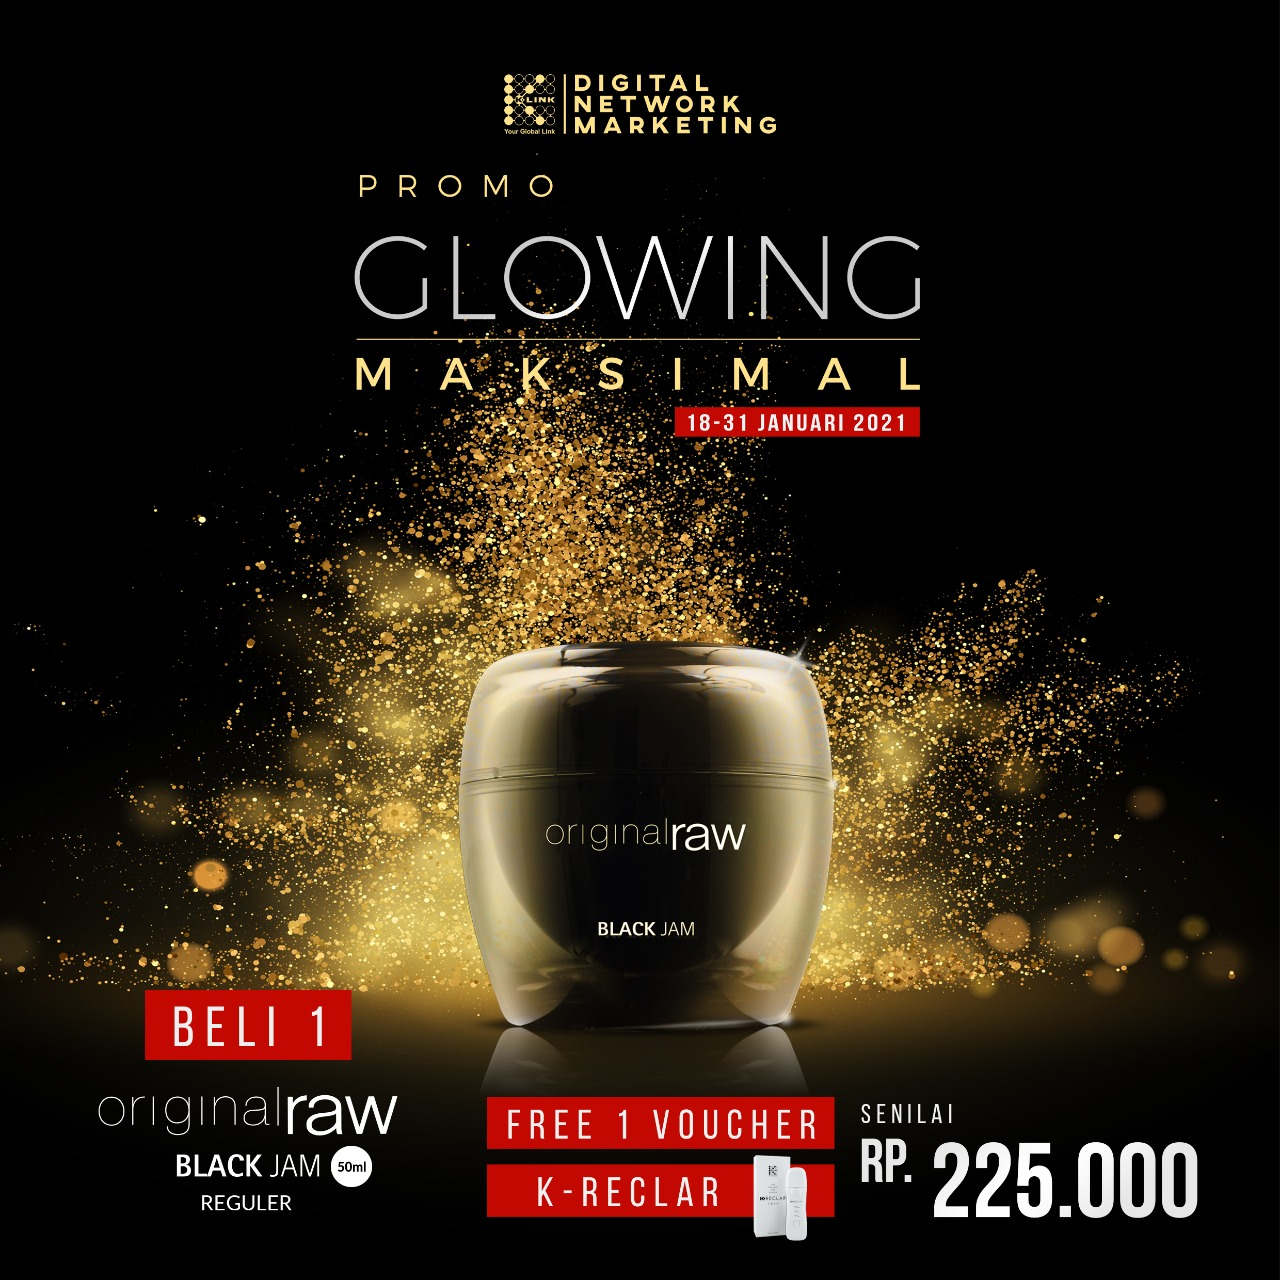 Promo Glowing Maksimal 18-31 Januari